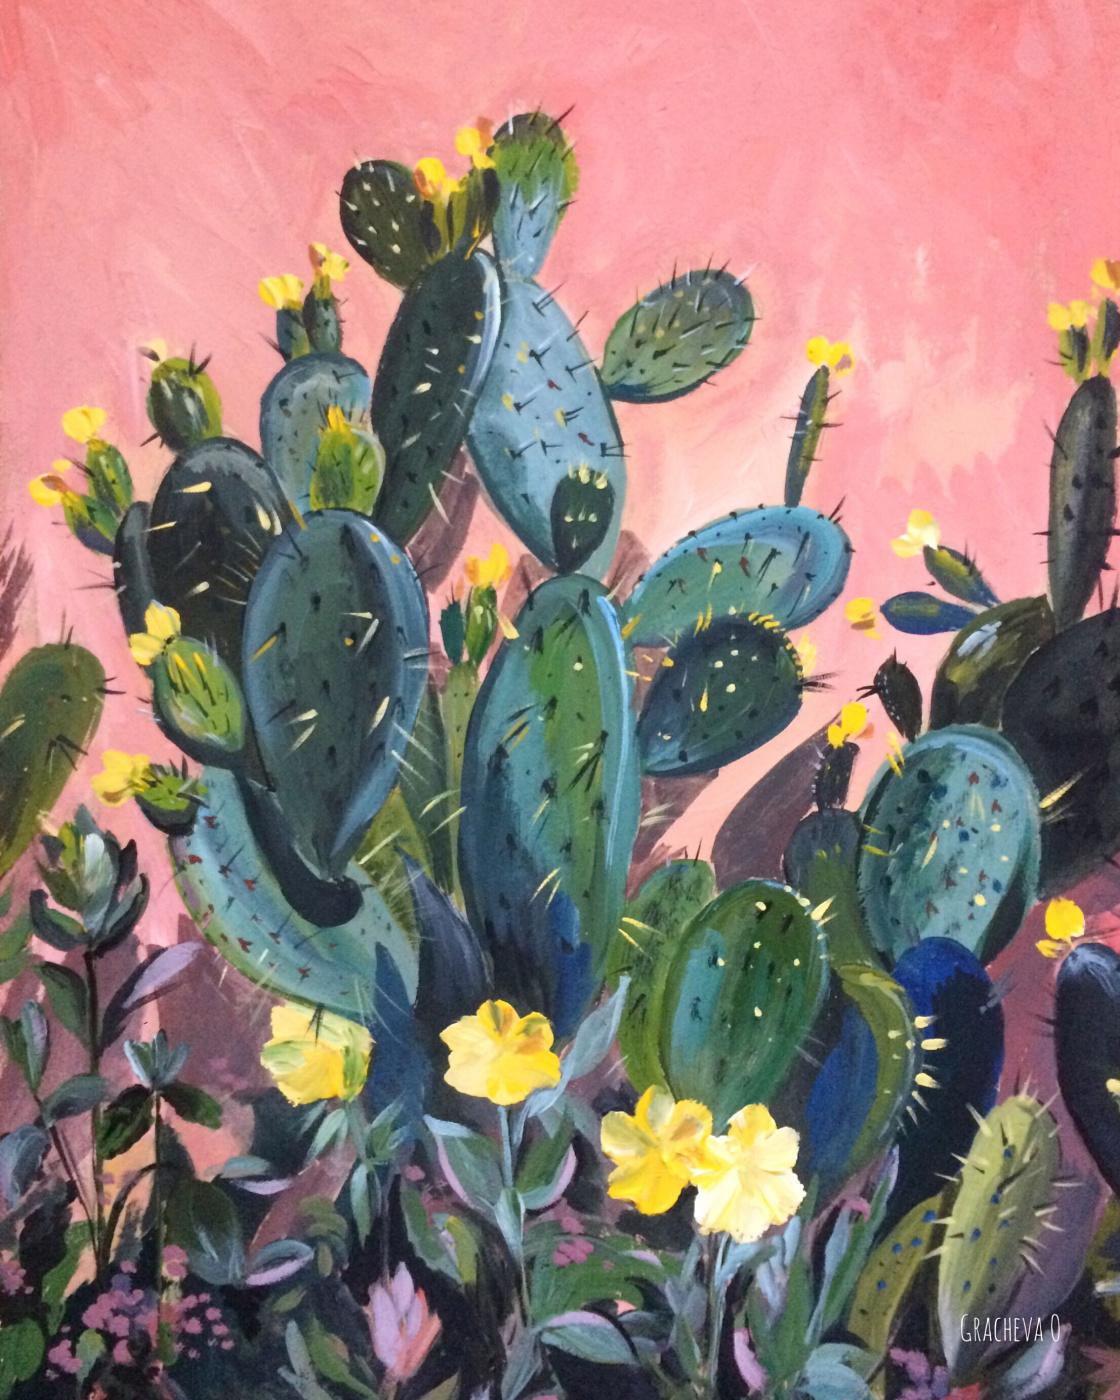 Oksana Gracheva. Cacti on the background of the pink fence